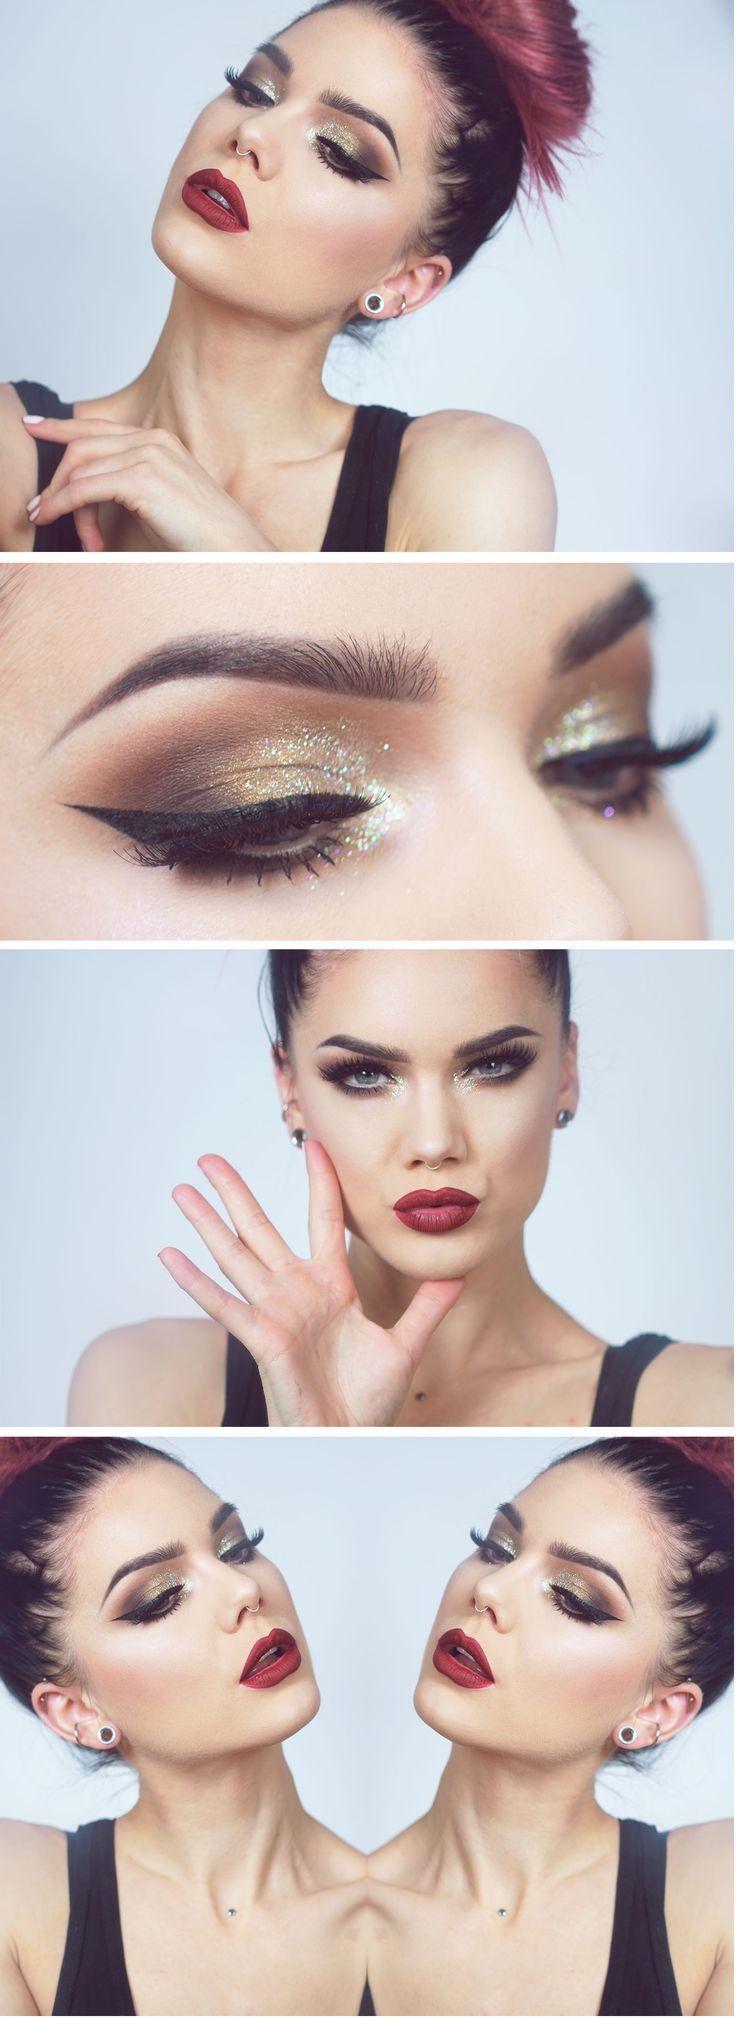 Makeup Artist ^^ | https://pinterest.com/makeupartist4ever/  Champagne wishes ... videotutorial check here: http://lindahallberg.se/2016/05/24/videotutorial-full-face-glam/